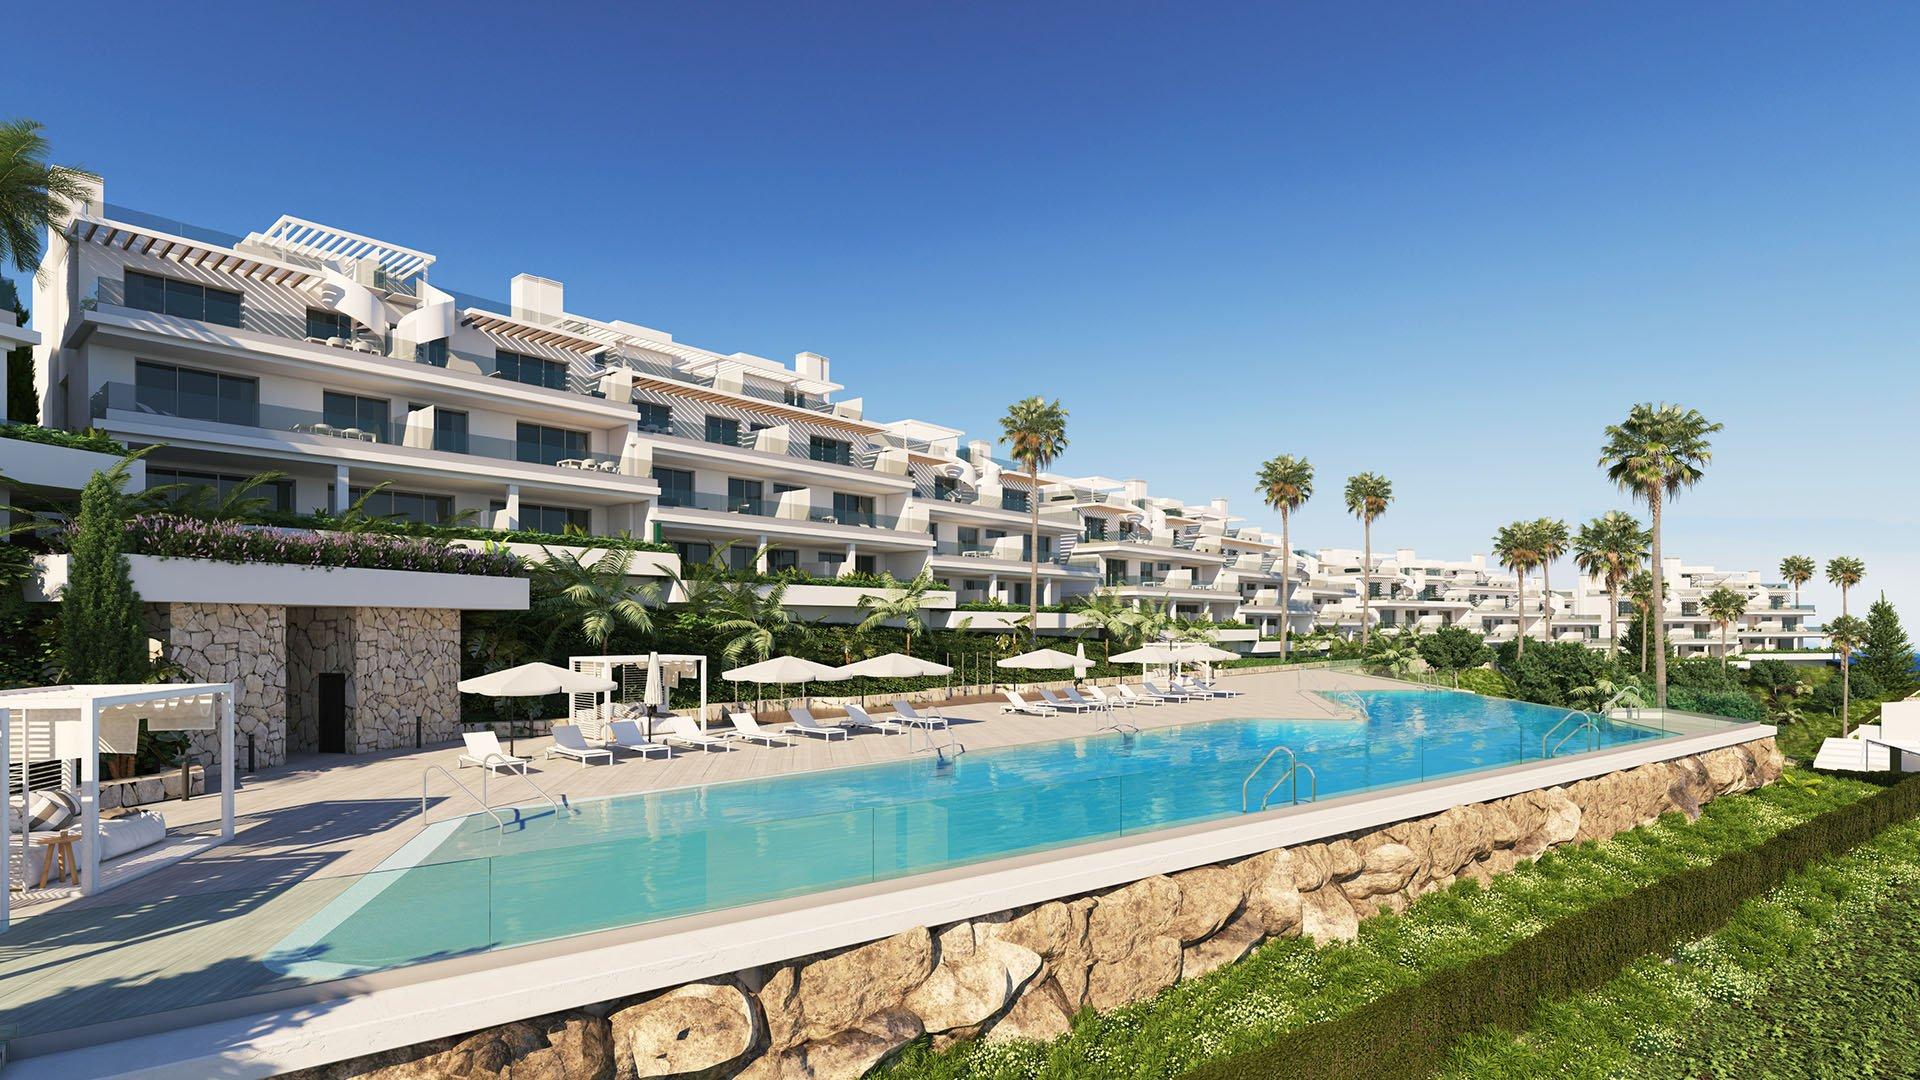 Oceana Views: Penthouses with stunning views